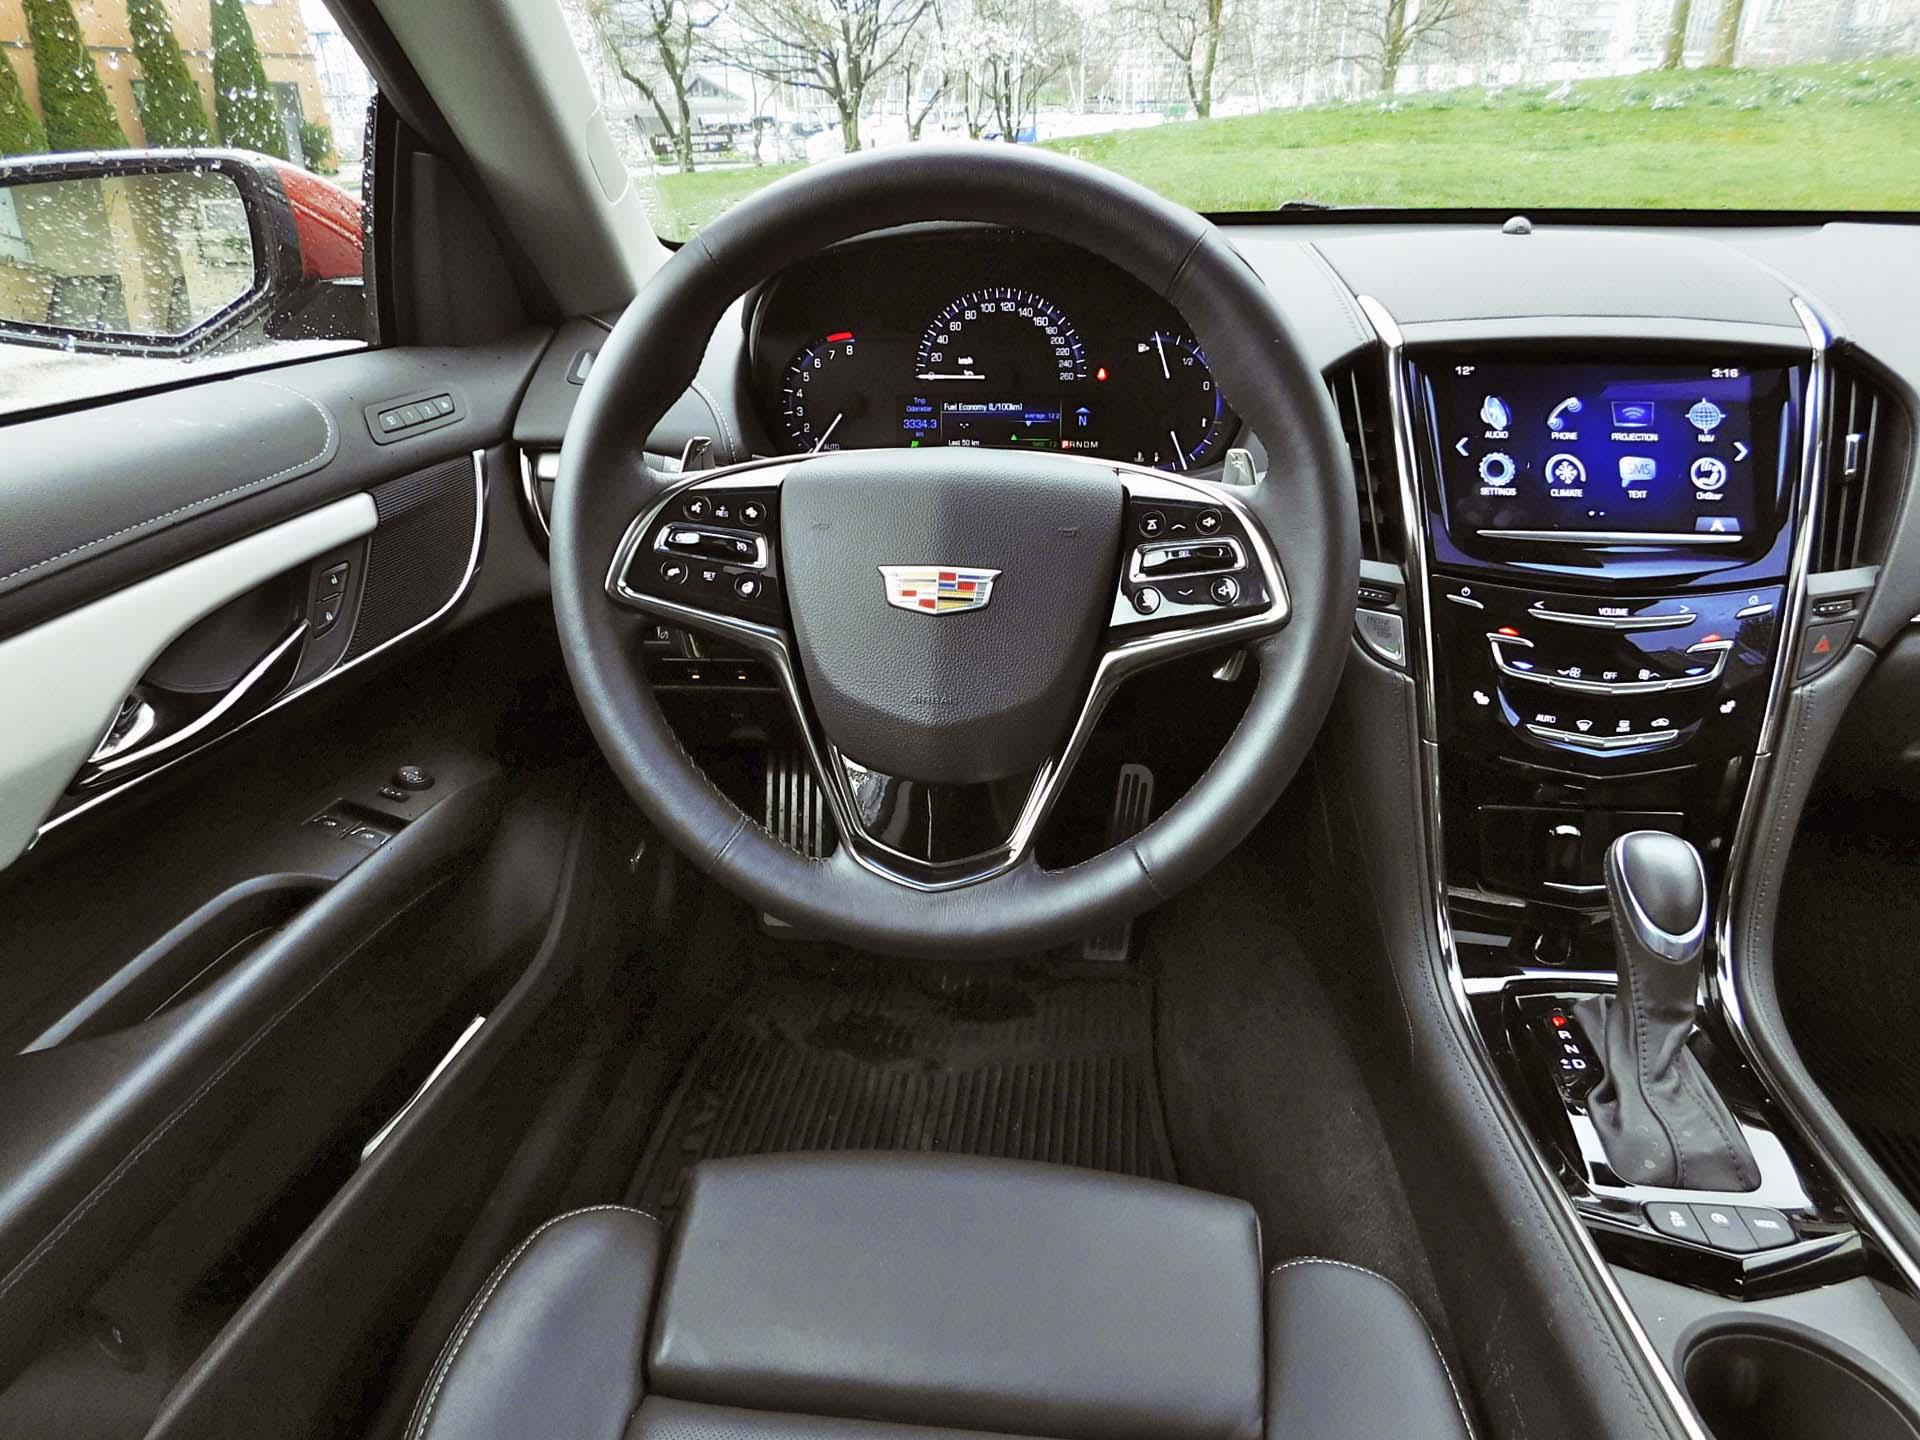 2016 Cadillac ATS-4 Coupe 2.0T AWD Performance - Autos.ca